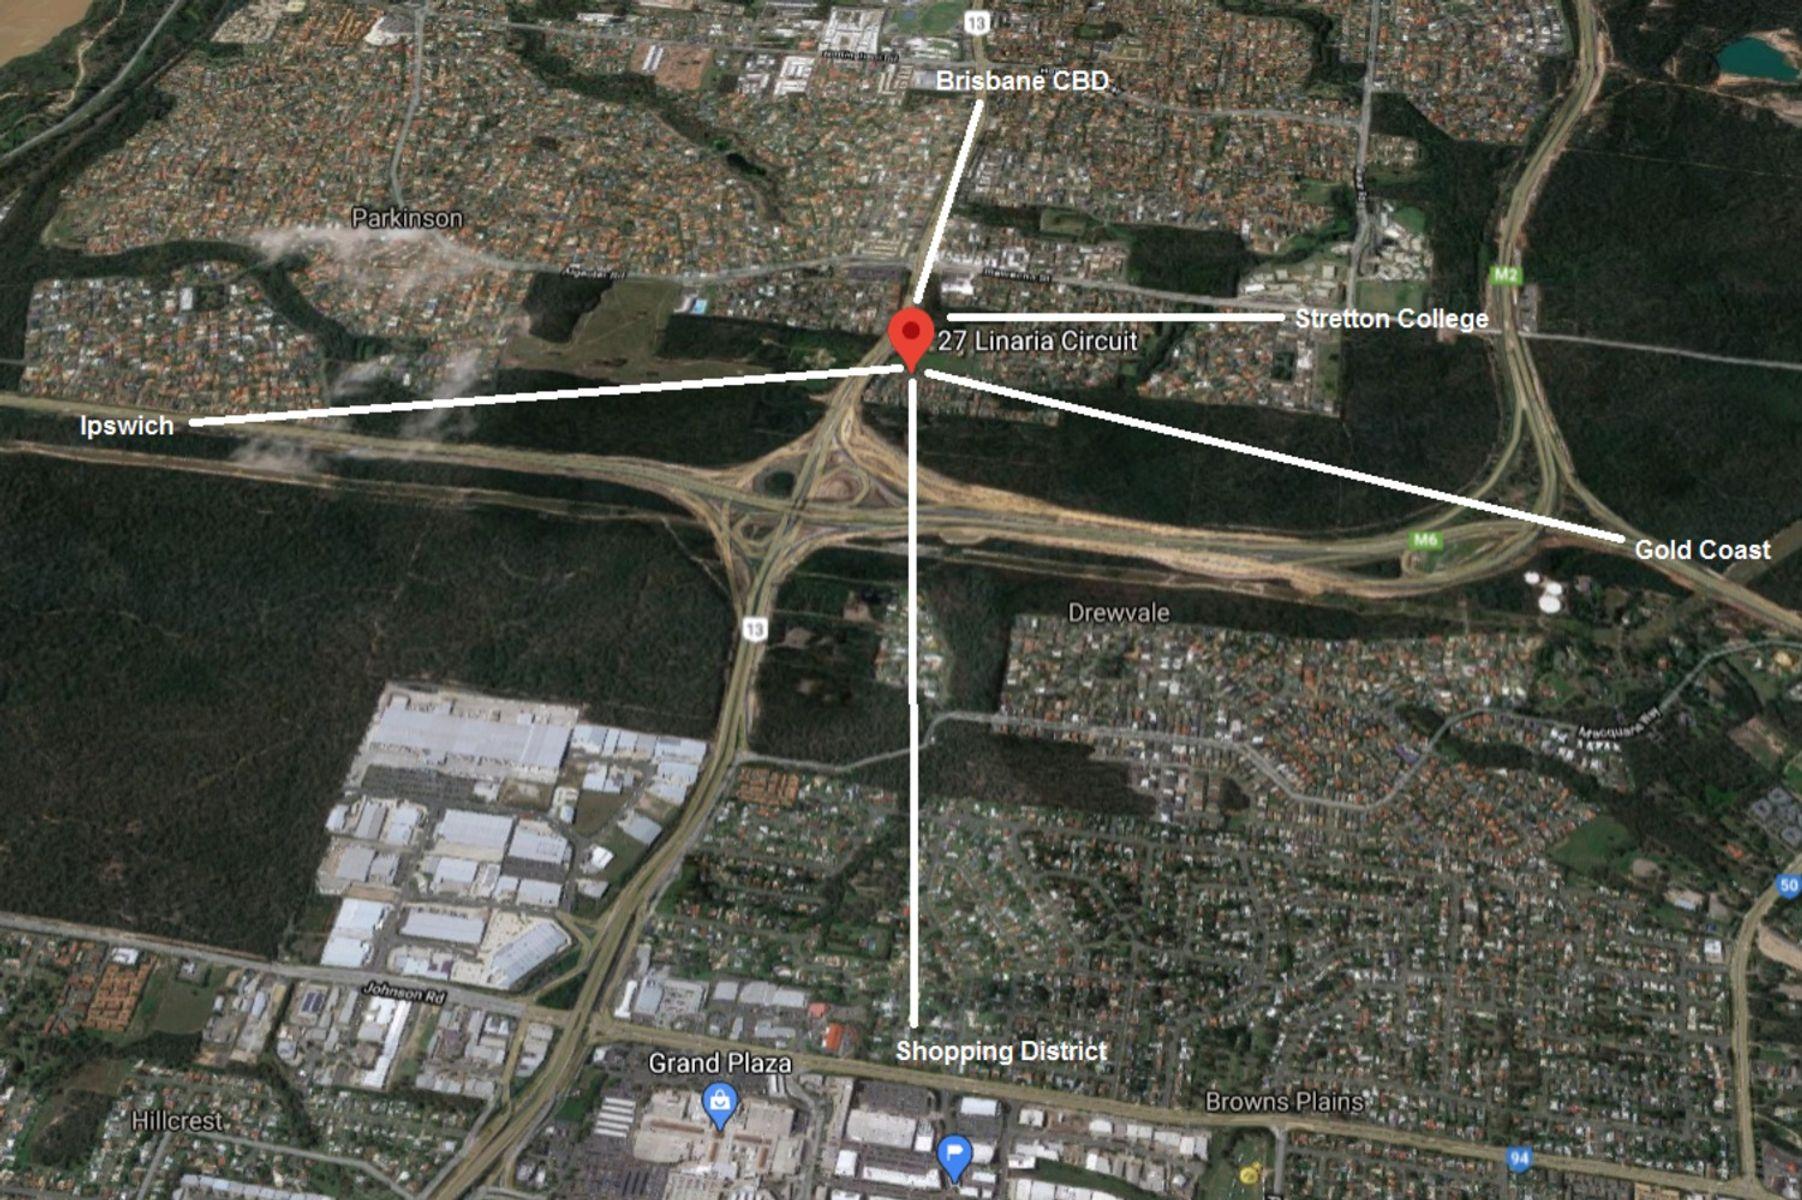 27 Linaria Circuit, Drewvale, QLD 4116